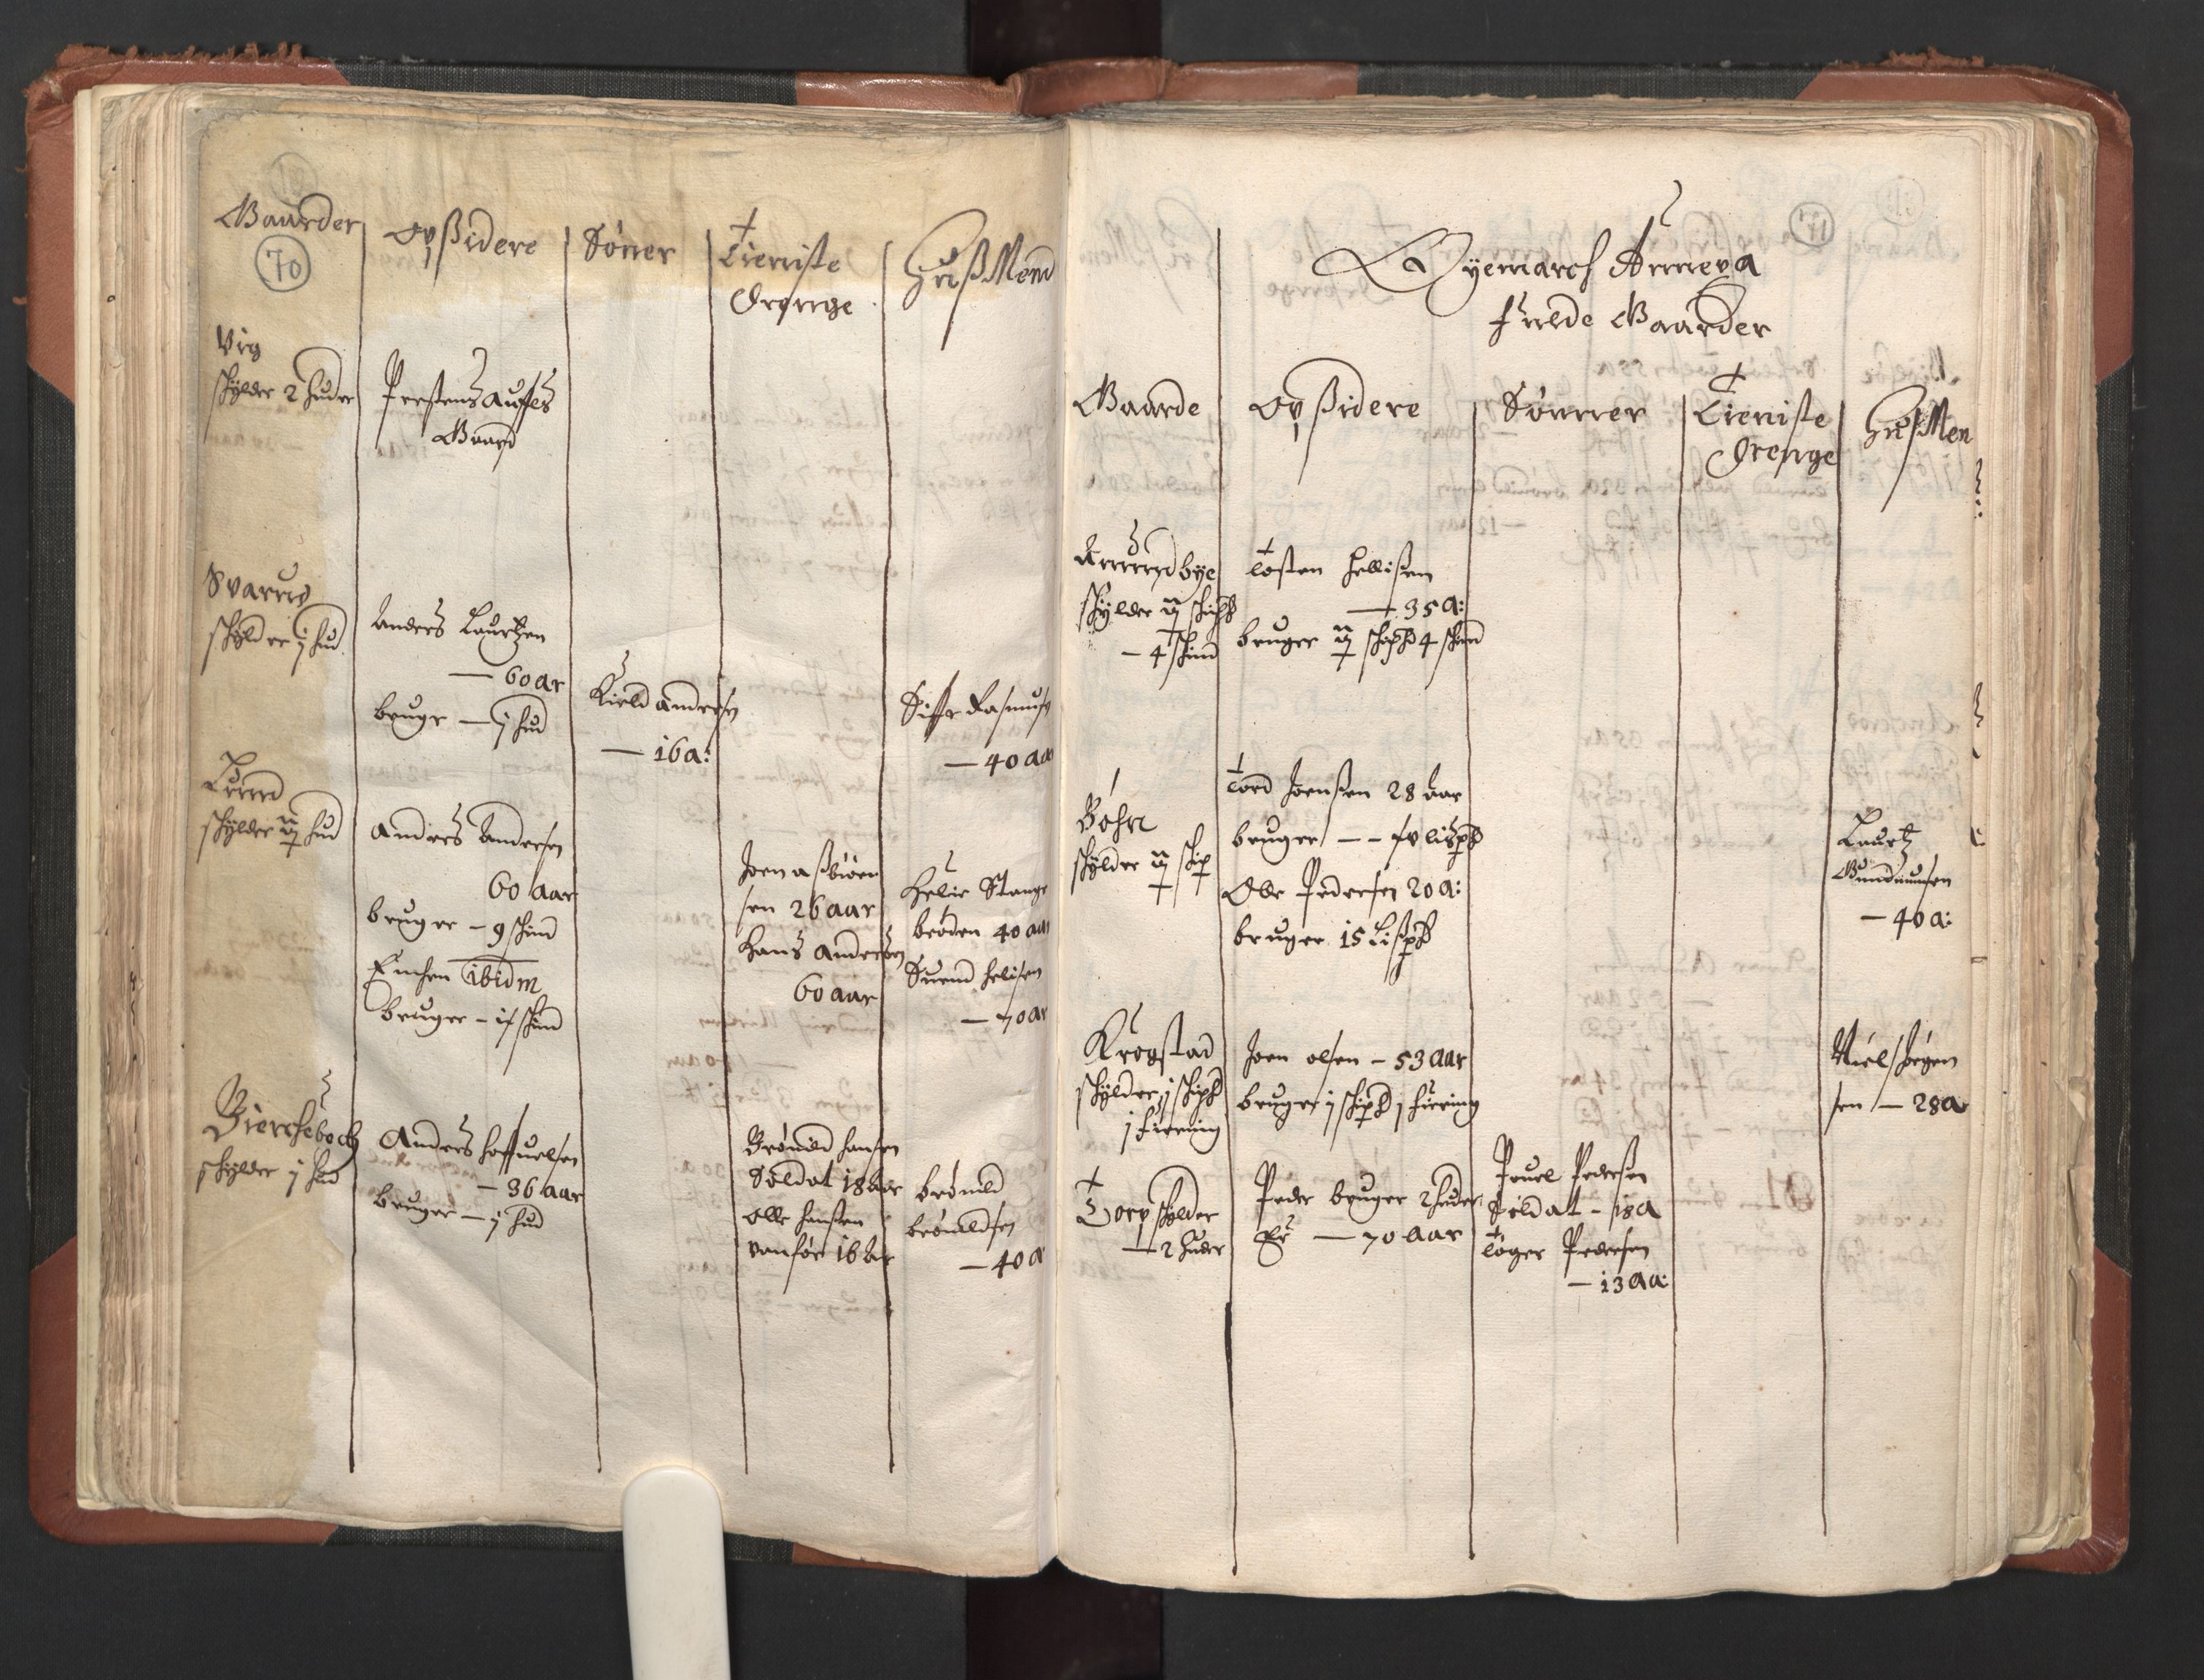 RA, Fogdenes og sorenskrivernes manntall 1664-1666, nr. 1: Fogderier (len og skipreider) i nåværende Østfold fylke, 1664, s. 70-71